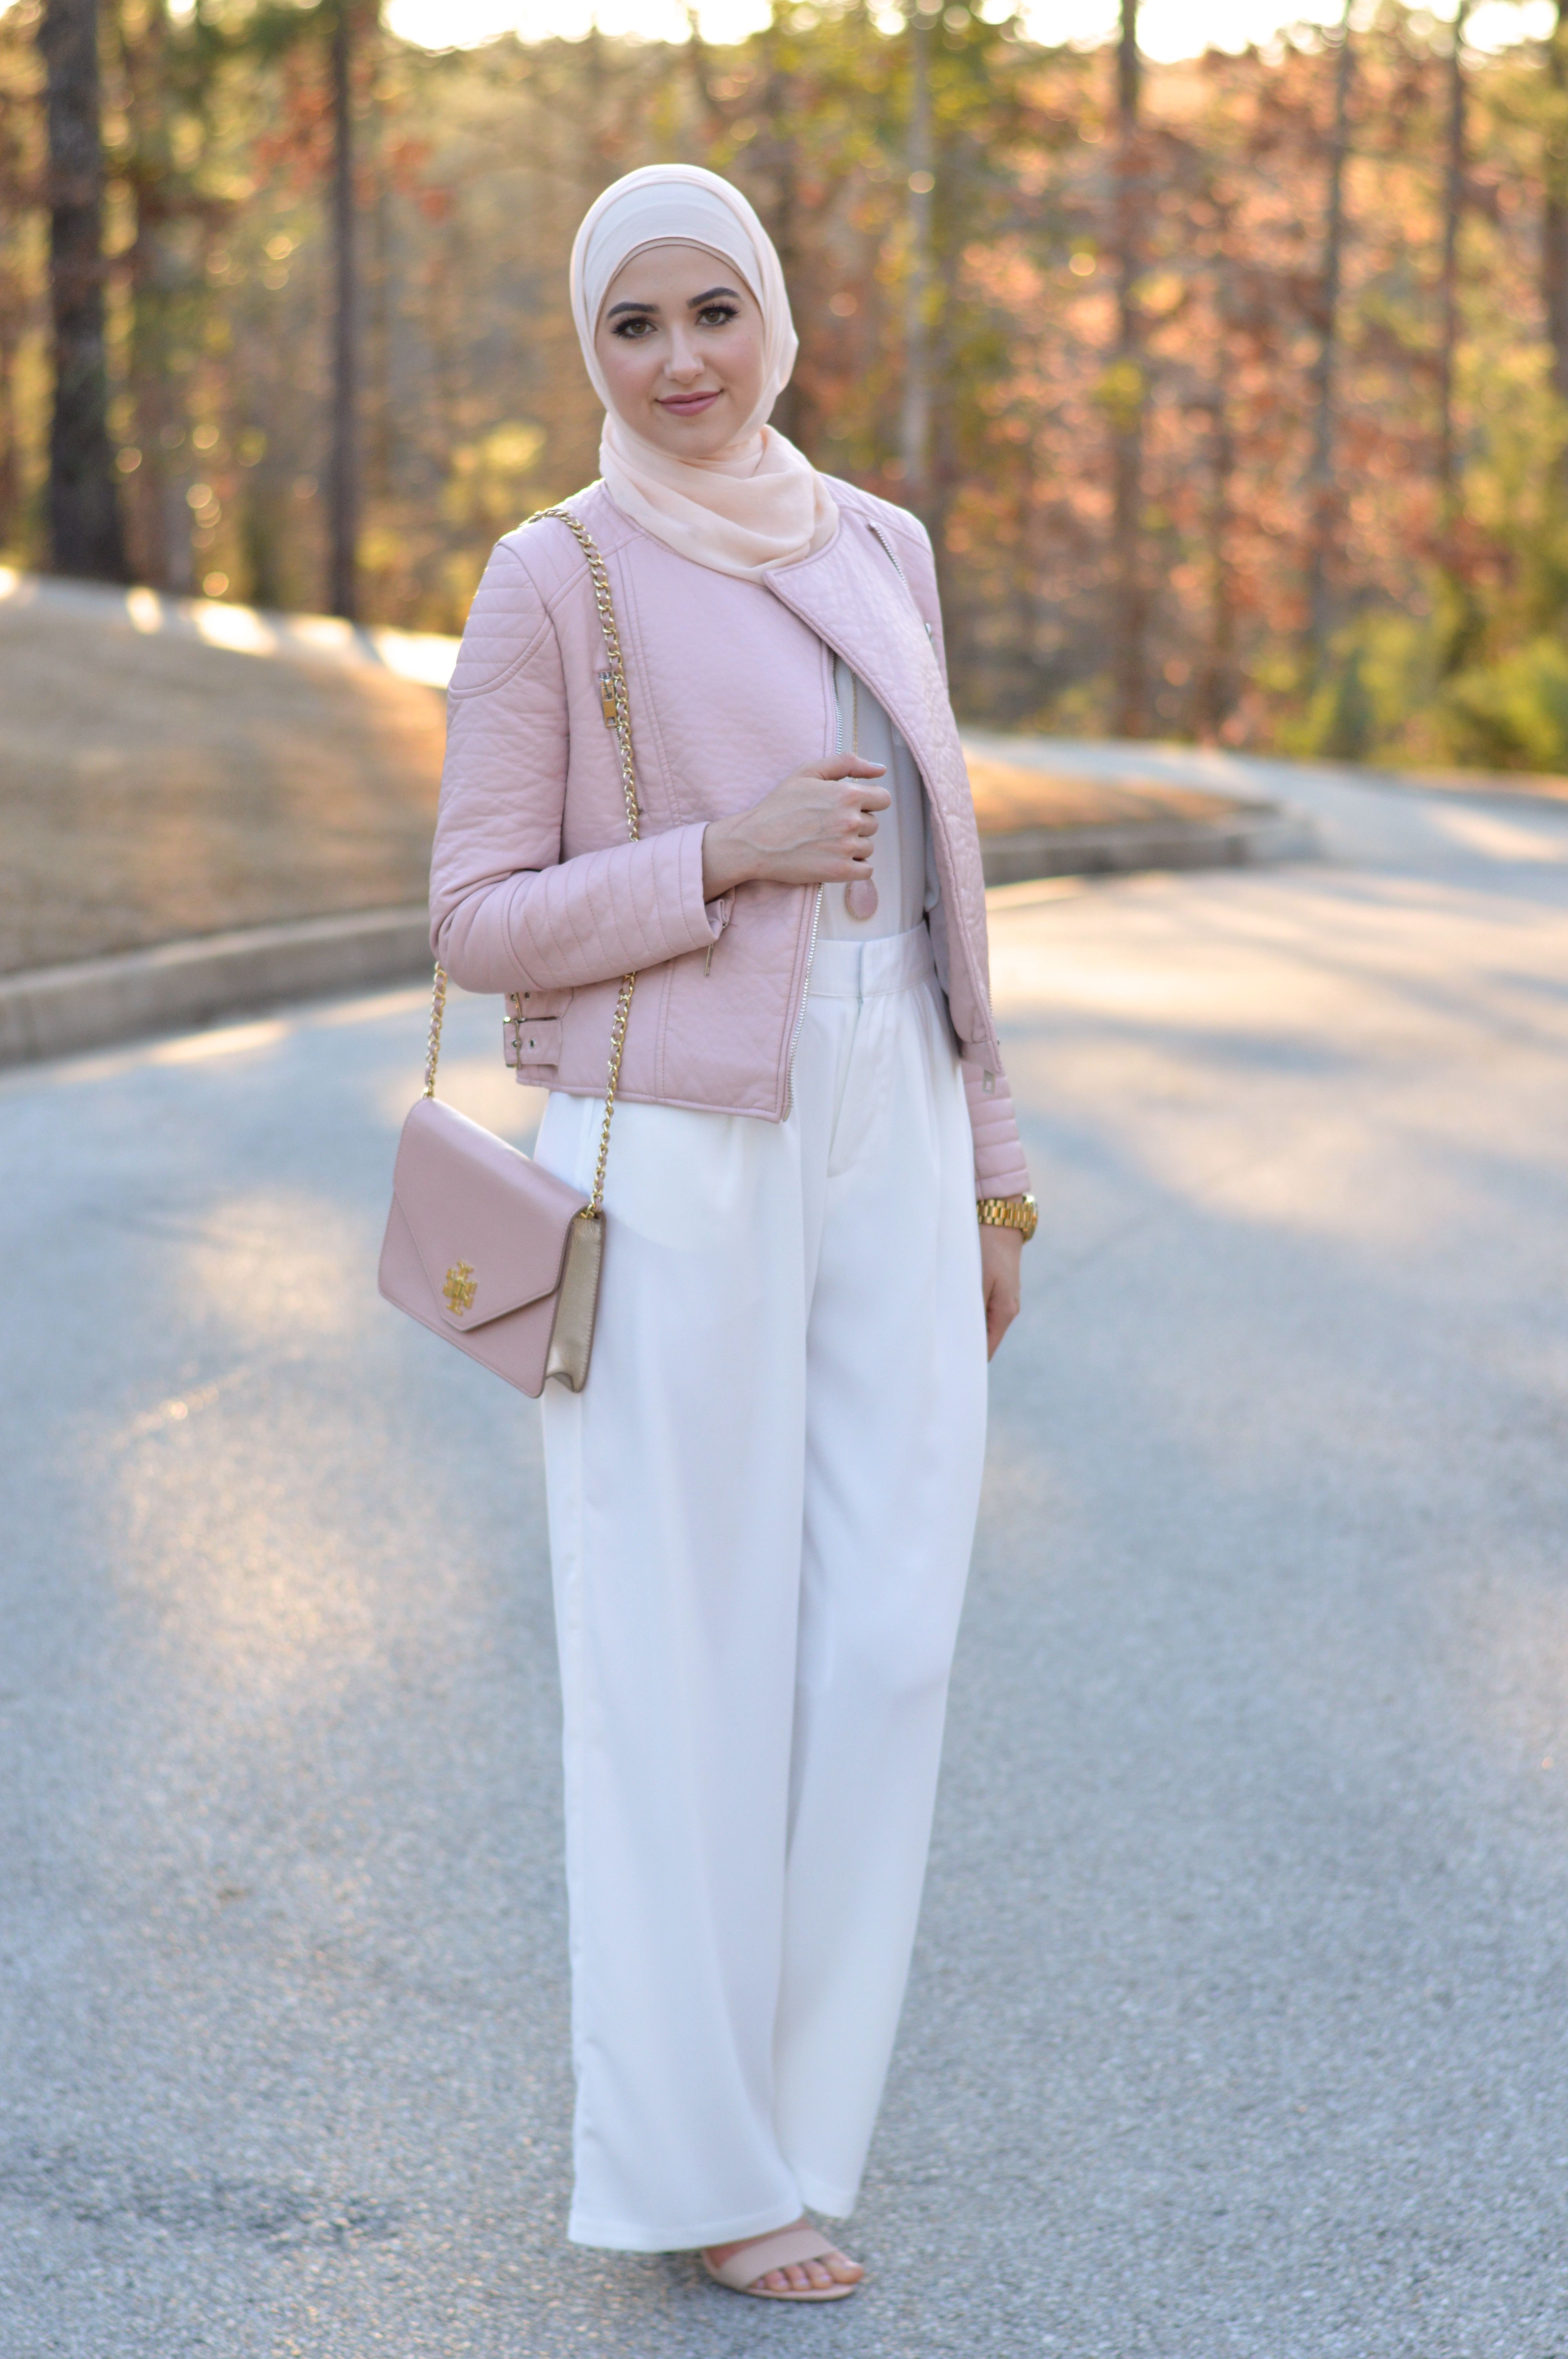 Leather jacket hijab - With Love Leena A Fashion Lifestyle Blog By Leena Asad